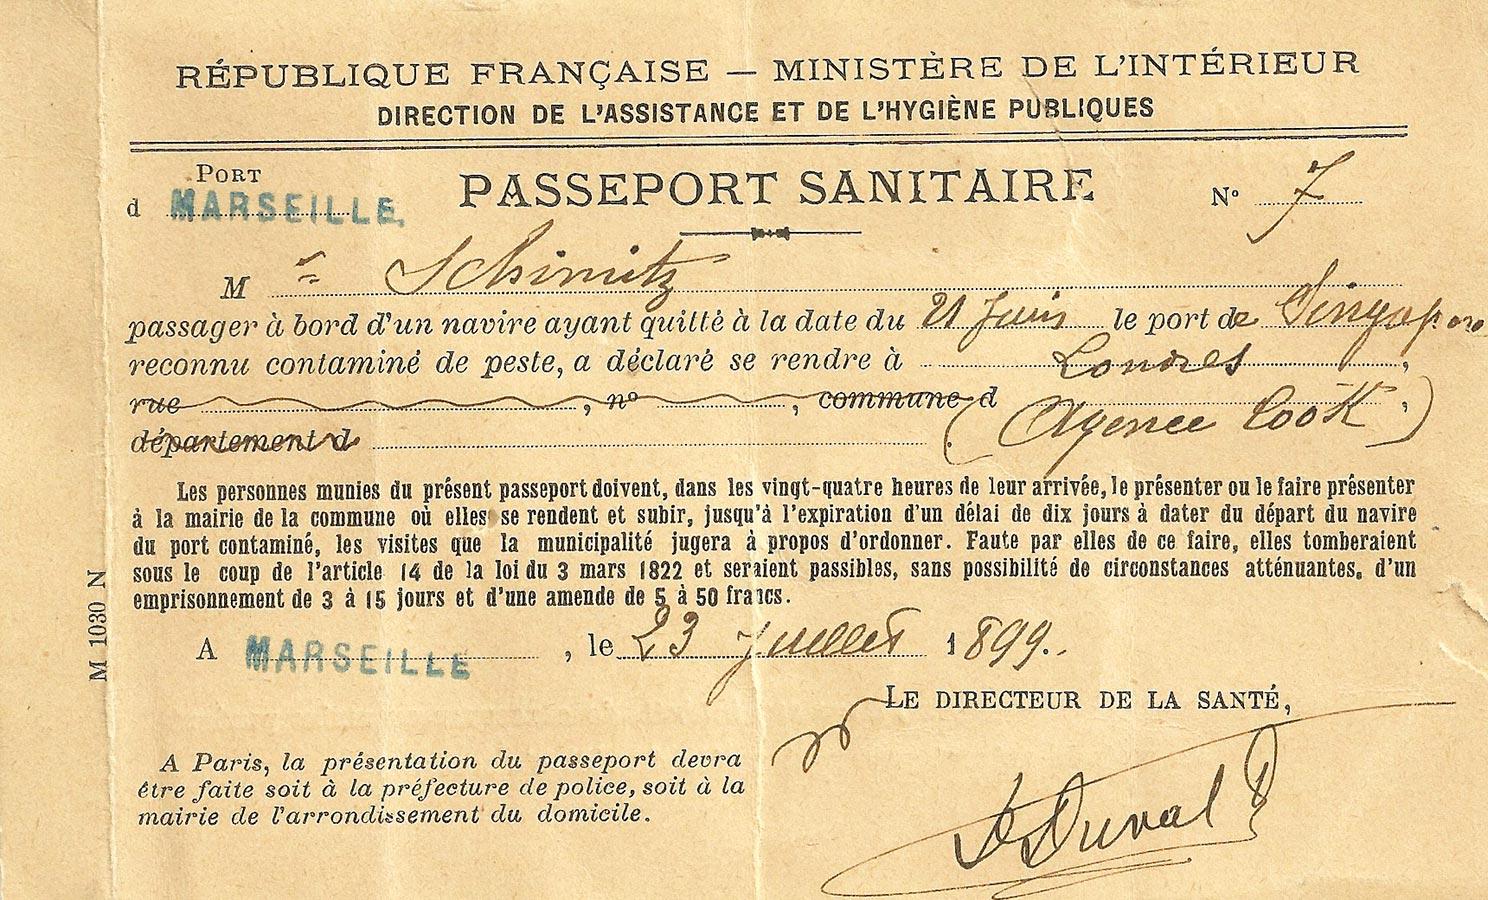 Passeport sanitaire / Gesundheitspass, 1899